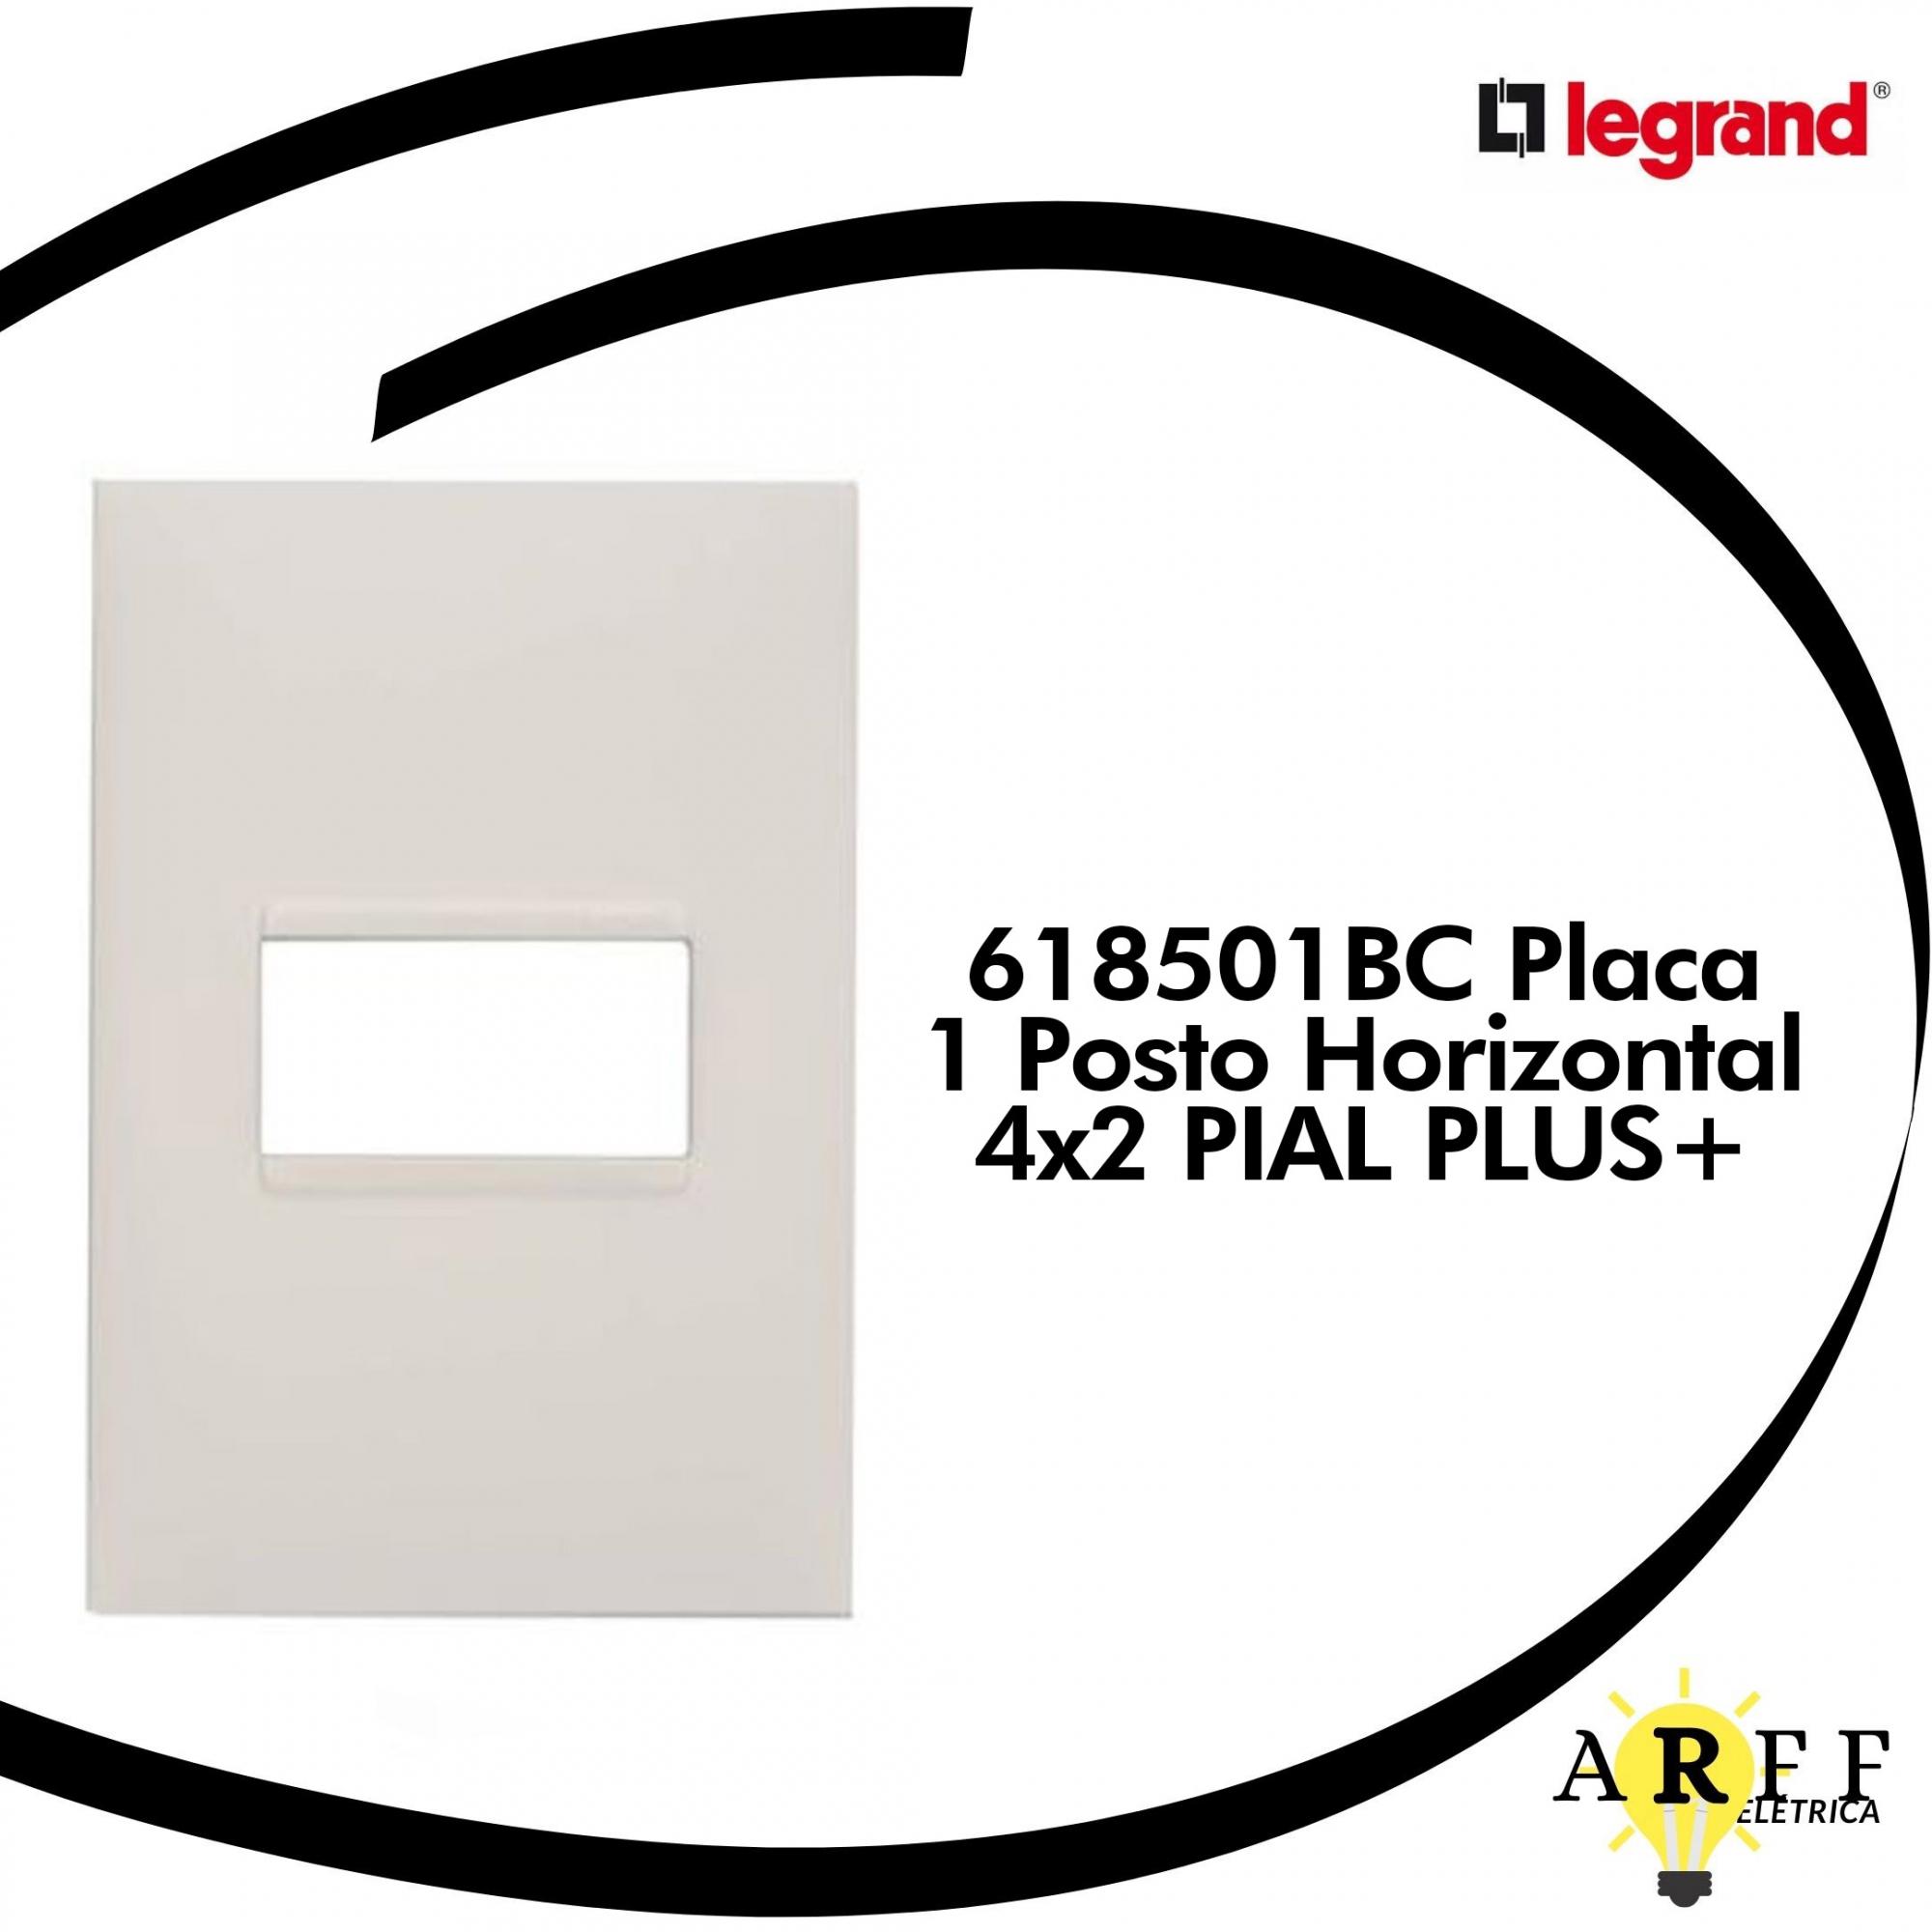 618501BC Placa  1 Posto Horizontal 4x2 PIAL PLUS+